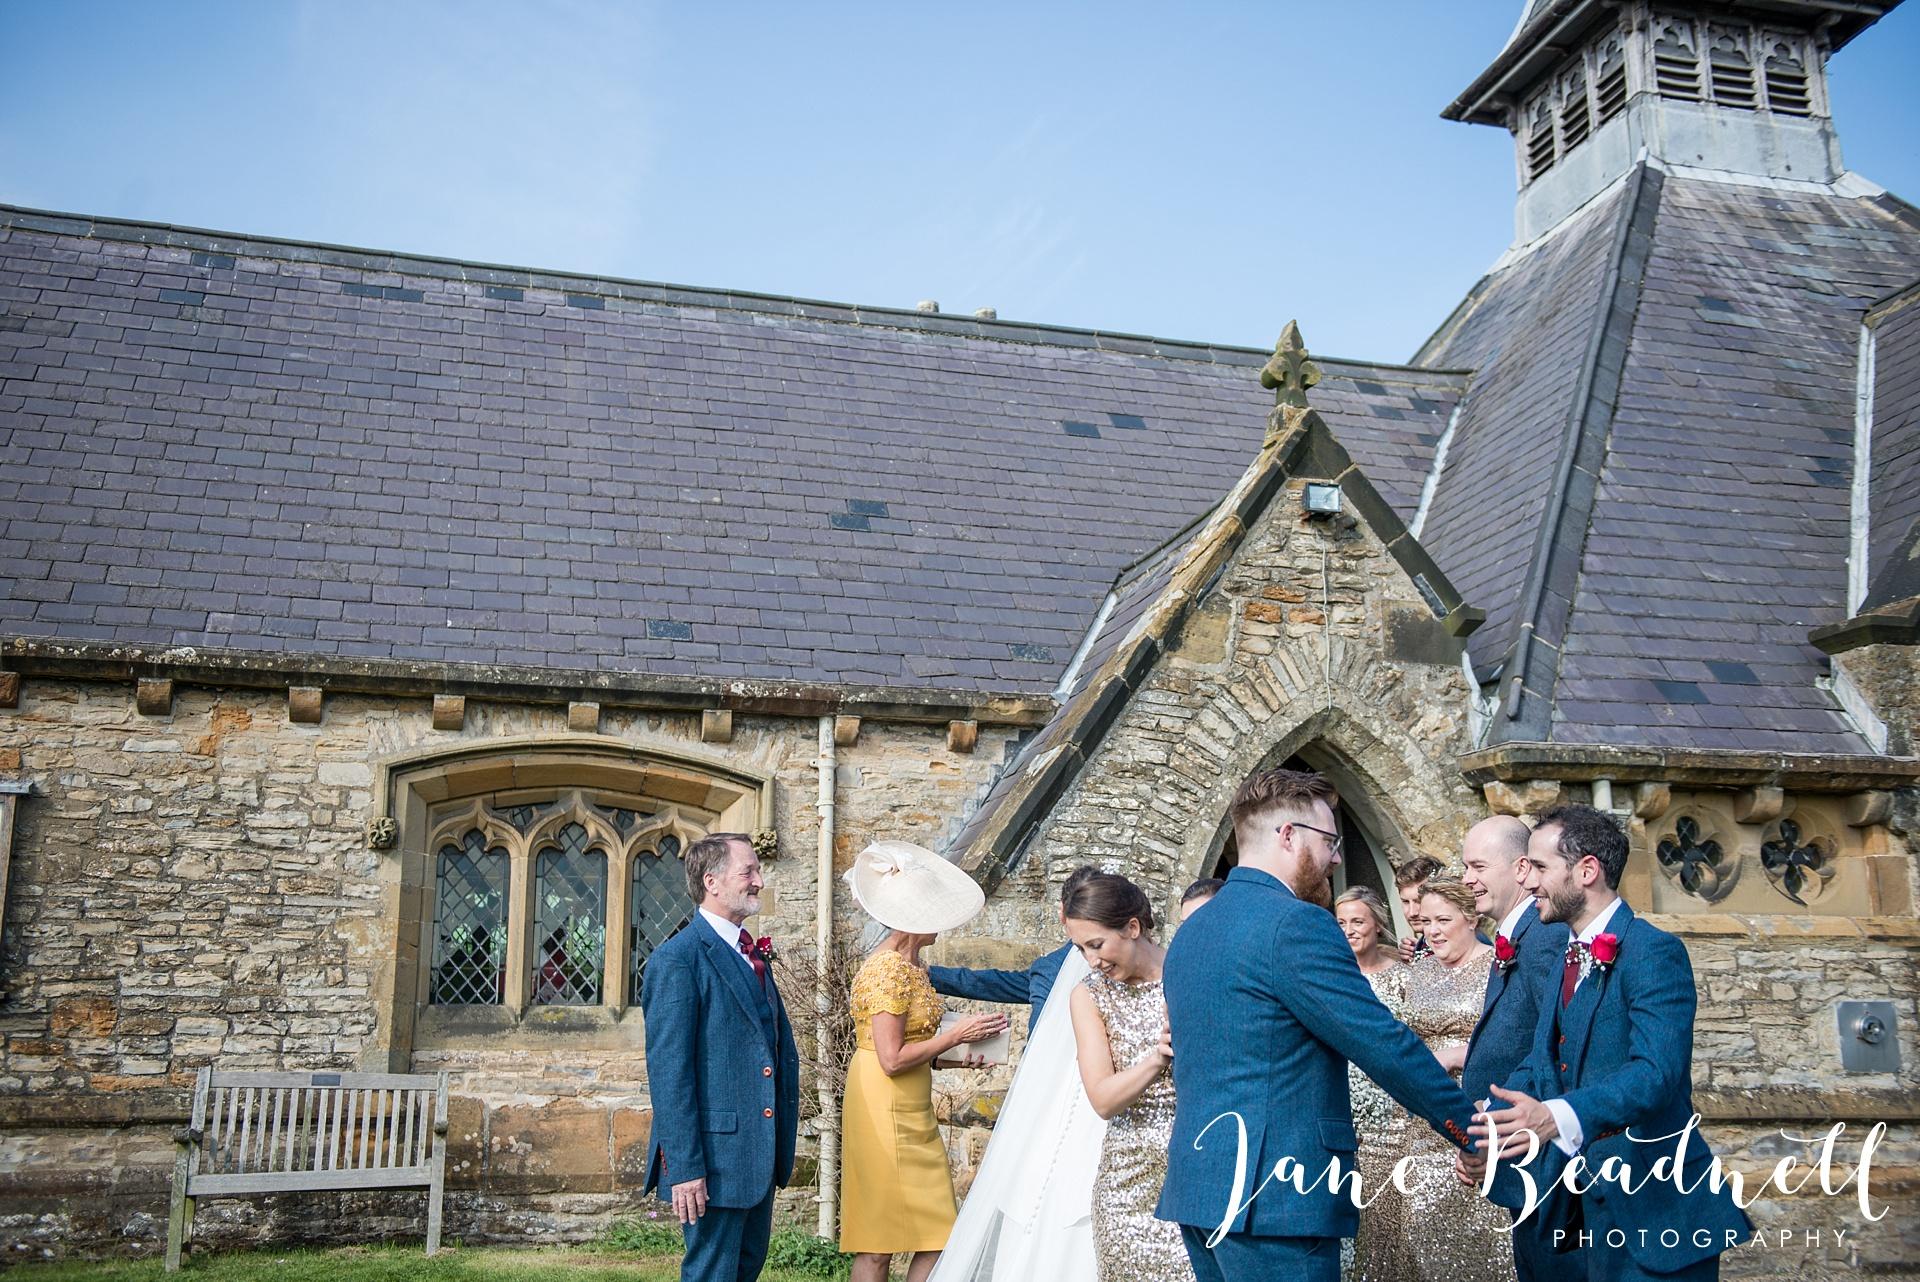 fine-art-wedding-photographer-jane-beadnell-yorkshire-wedding-photographer_0055